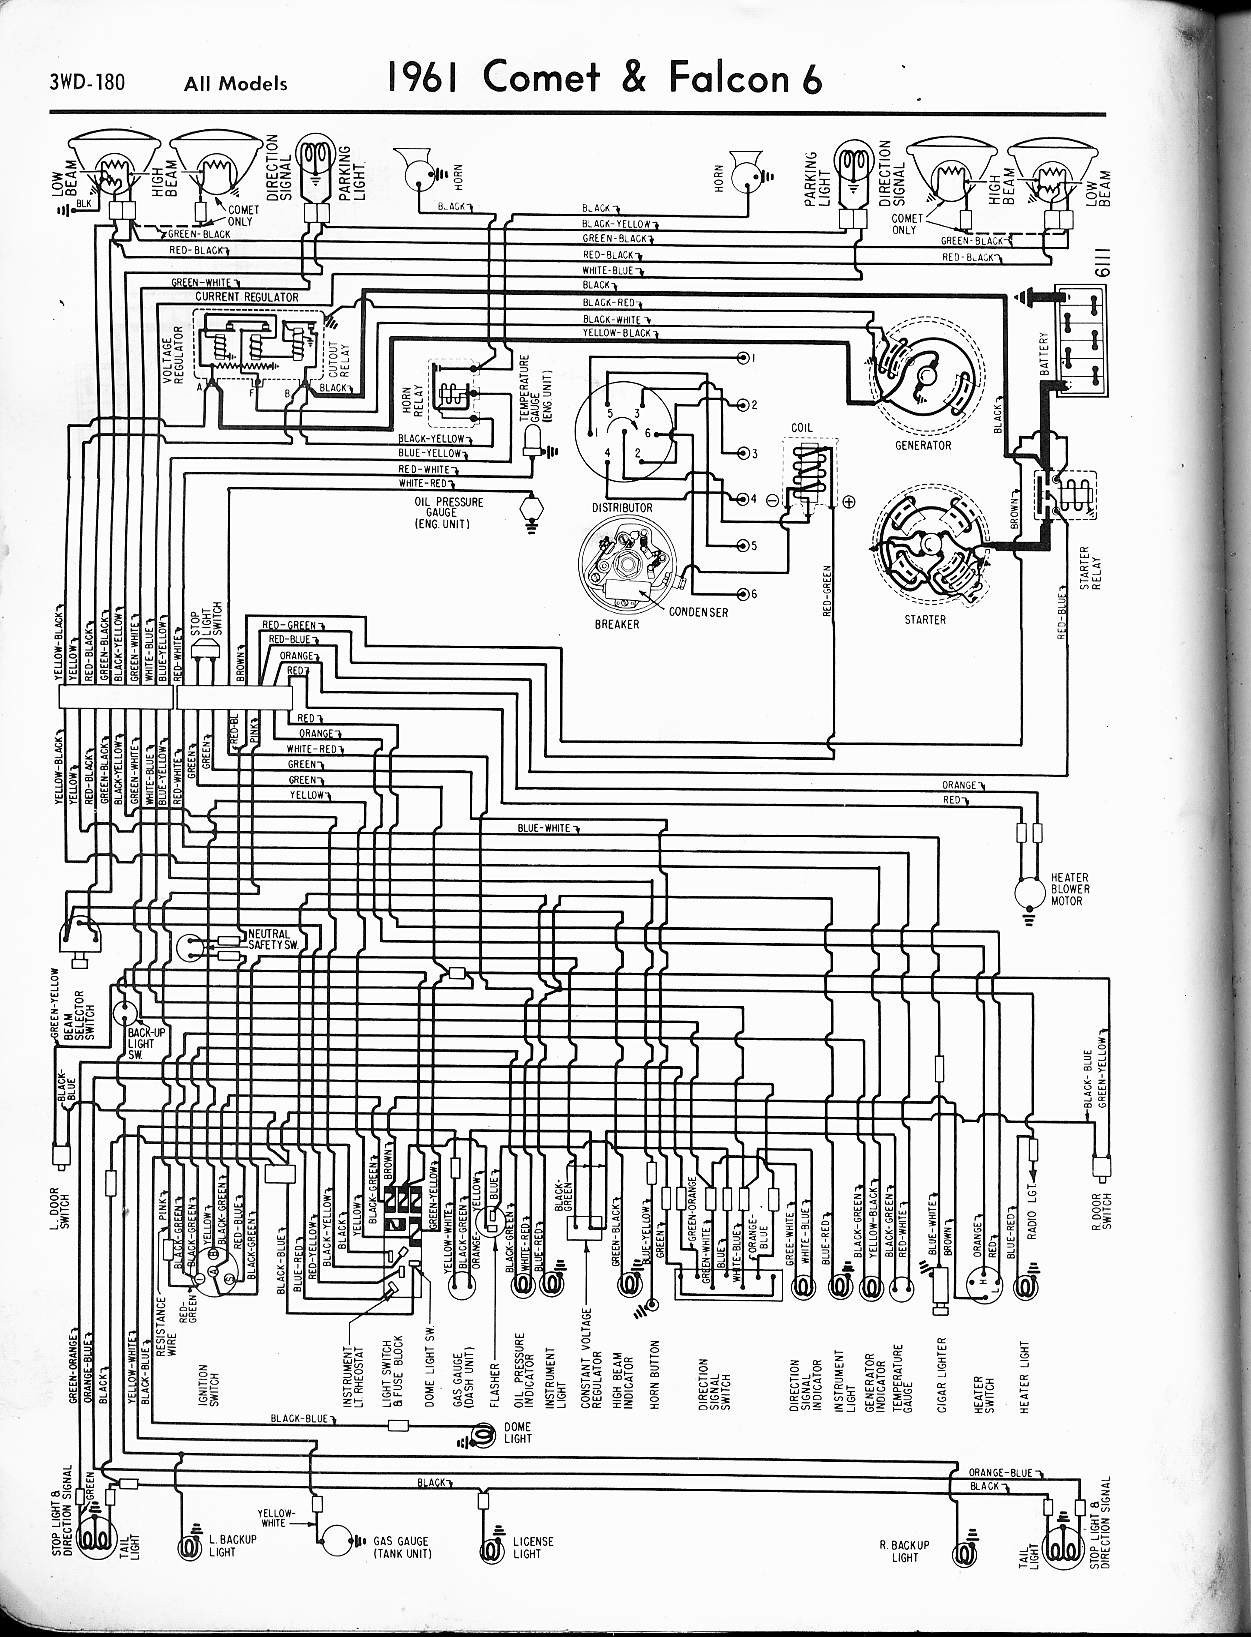 Car Cigarette Lighter Wiring Diagram 57 65 ford Wiring Diagrams Of Car Cigarette Lighter Wiring Diagram